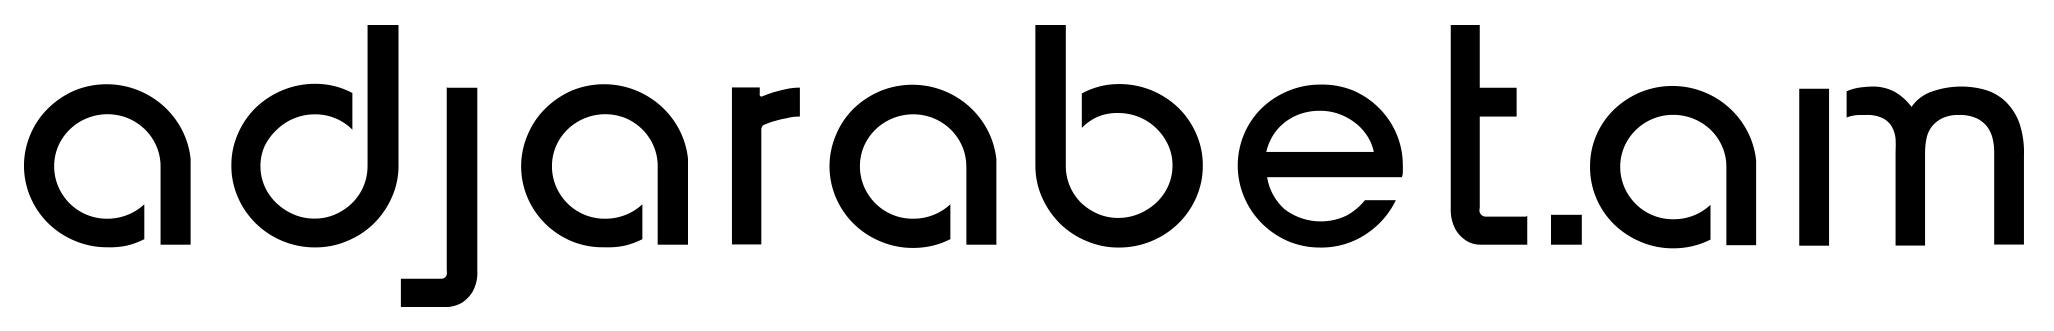 Adjarabet